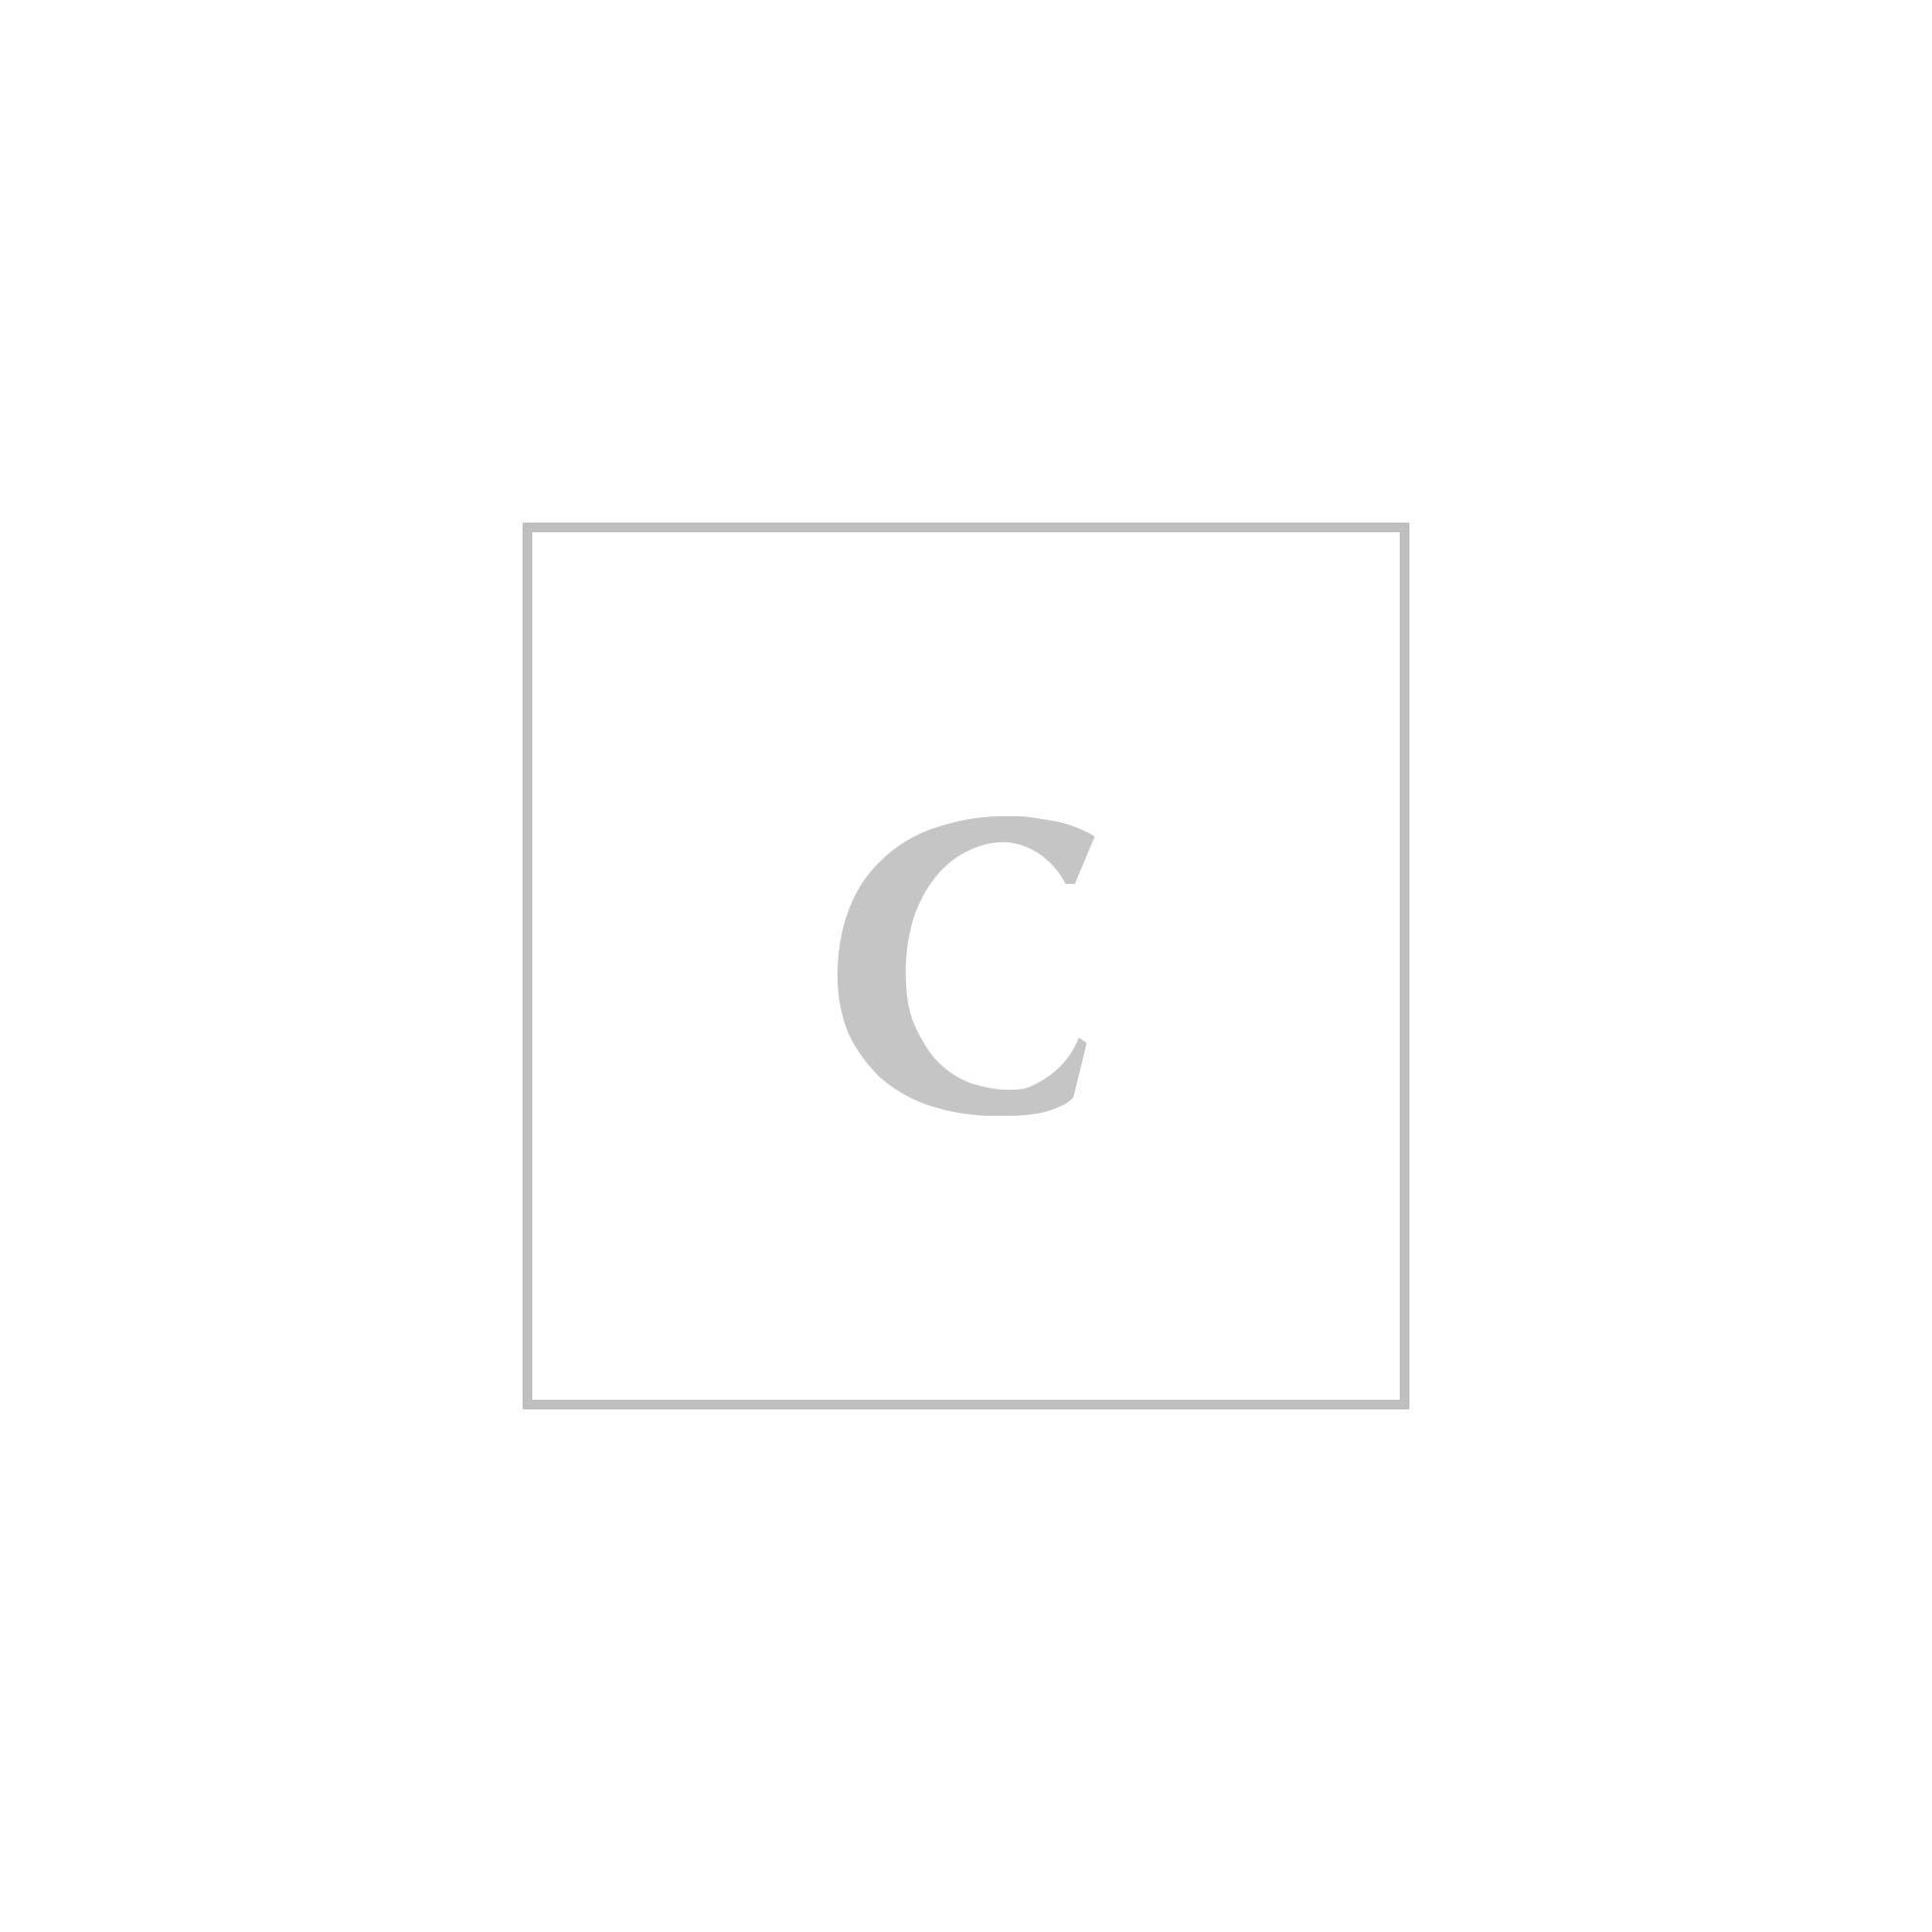 Saint laurent ysl monogram card holder